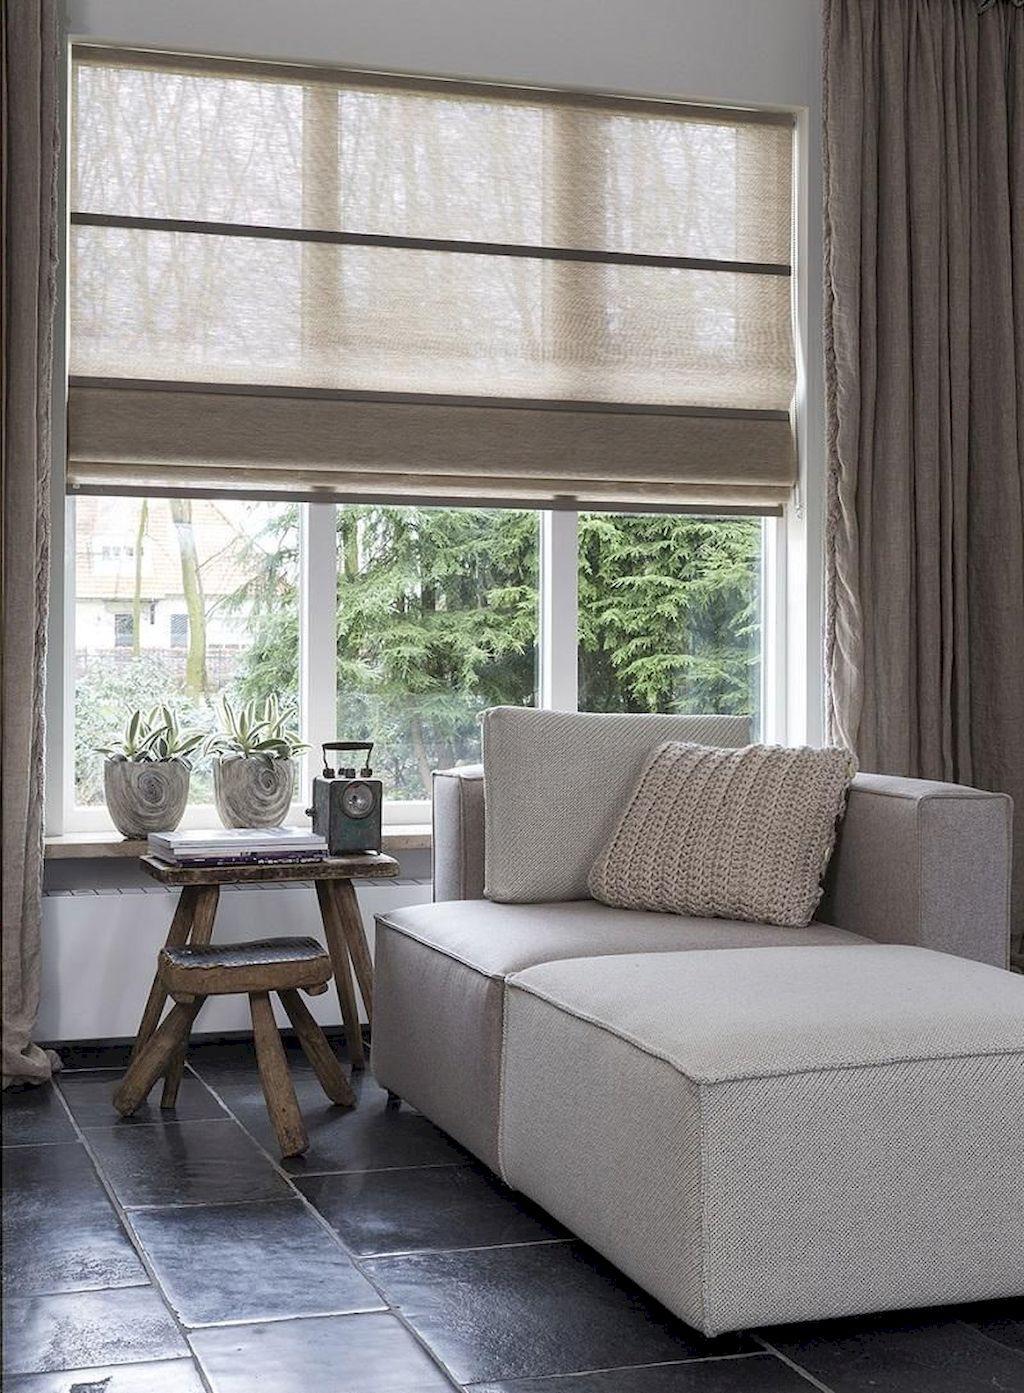 40 Creative And Inspiring Home Windows Design Ideas Buildecor Co Roman Blinds Living Room Living Room Decor Furniture Casual Living Room Furniture #roman #blinds #living #room